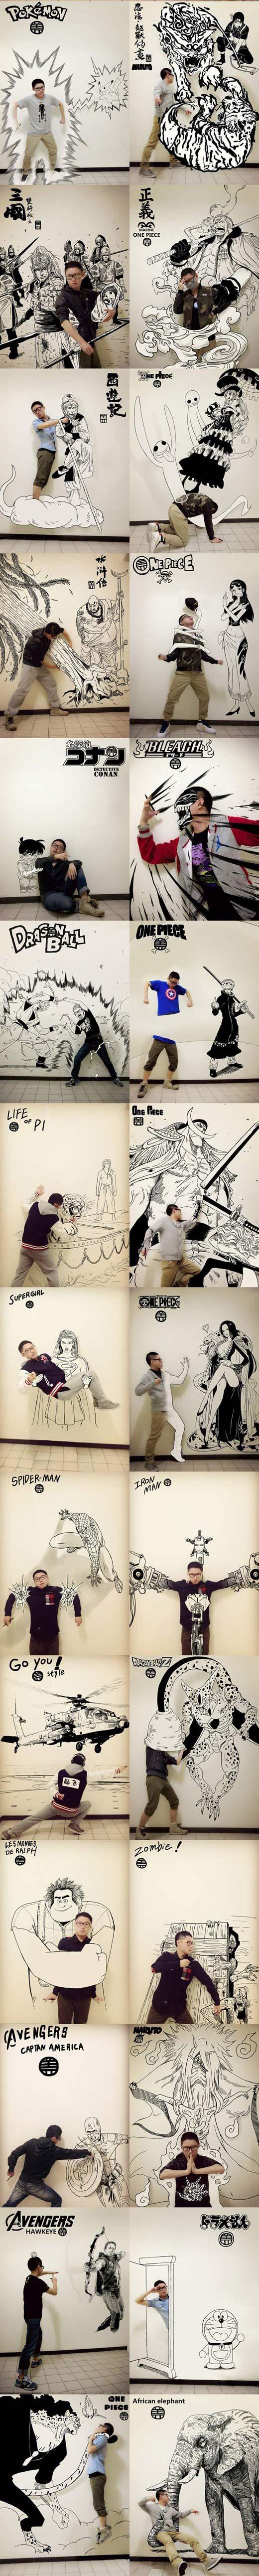 cool-Asian-guy-art-comics